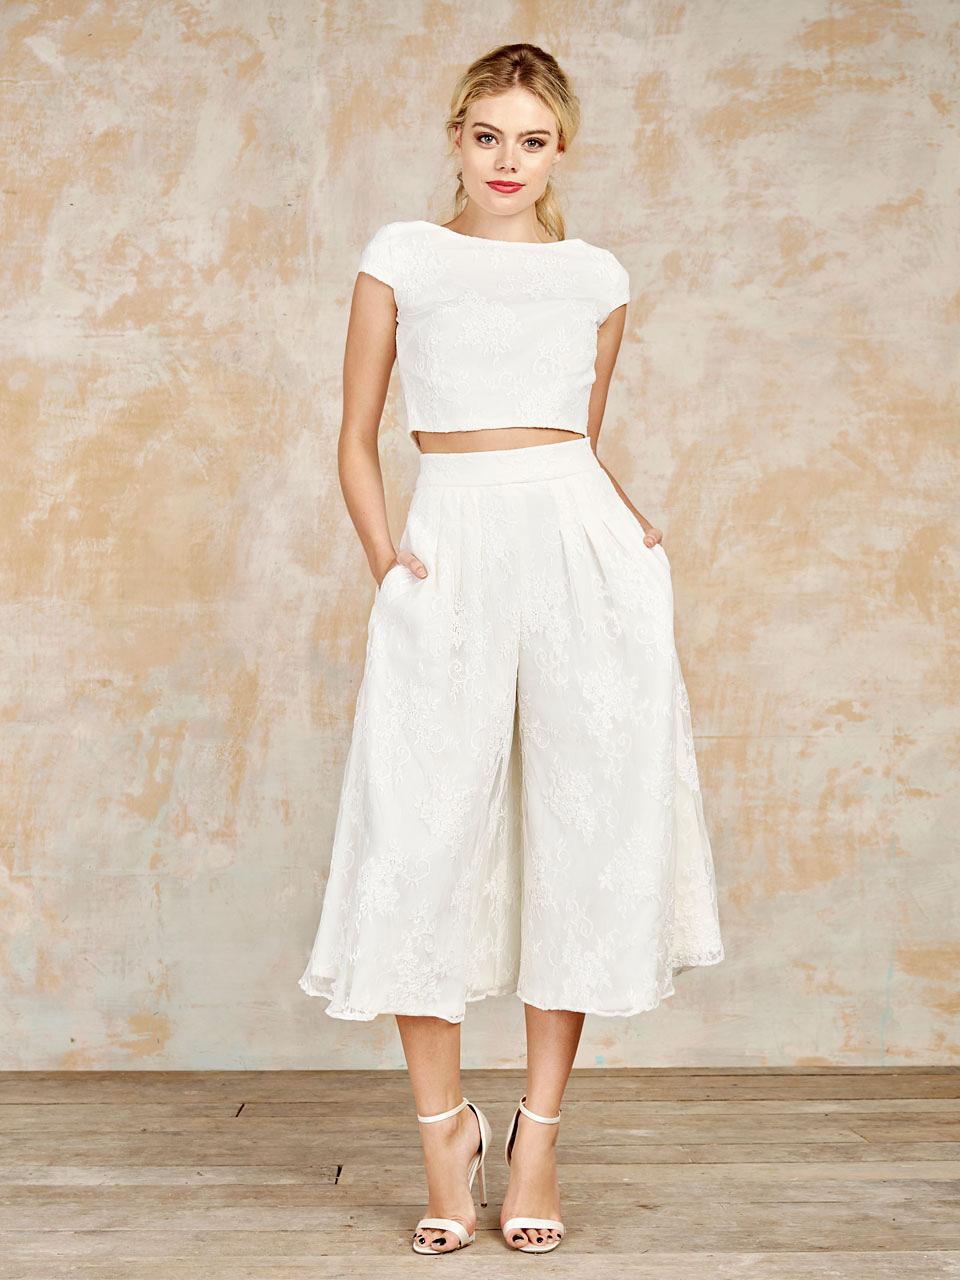 75701ed0fc6 ... wpid house of ollichon bridal jumpsuits - Bridal Jumpsuits and Separates  by House of Ollichon